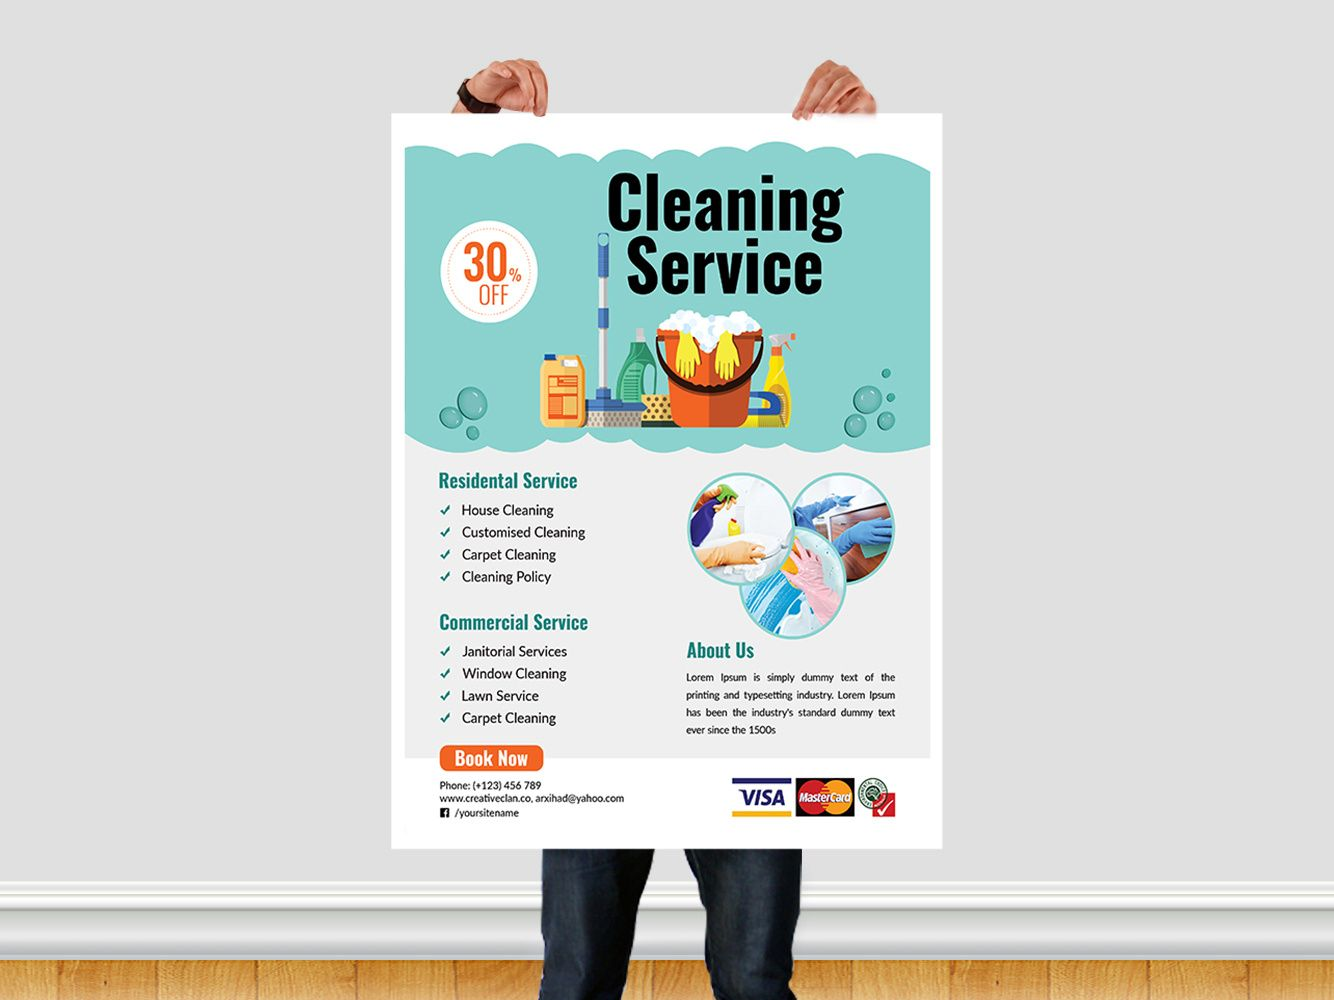 Cleaning Service Flyer Templatear Xihad On Dribbble inside